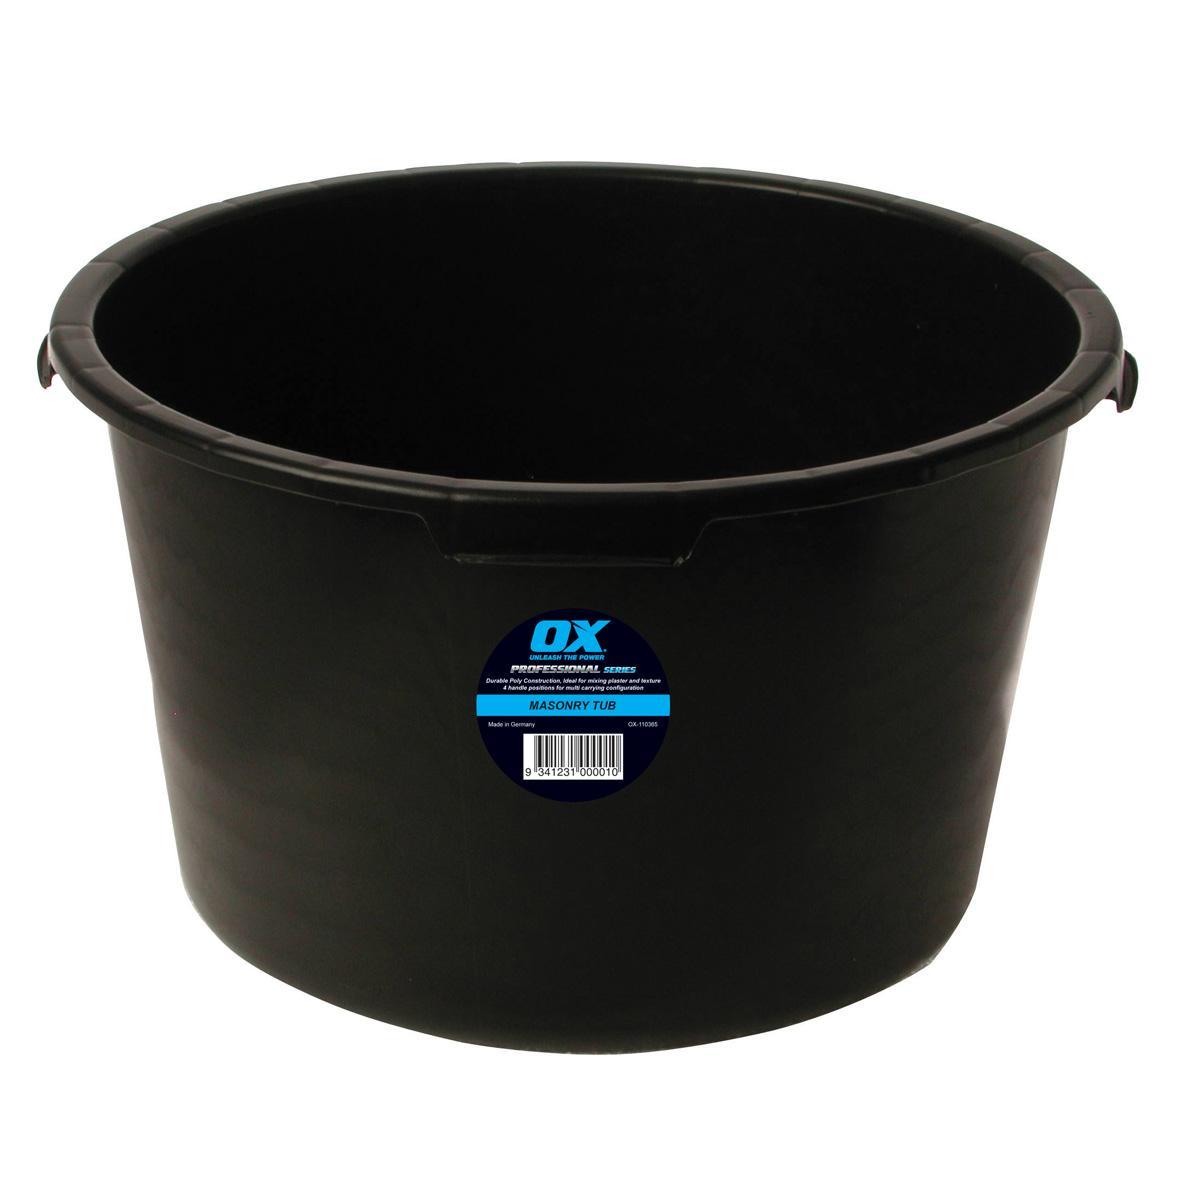 OX Prof Masonary Tub 65Ltr